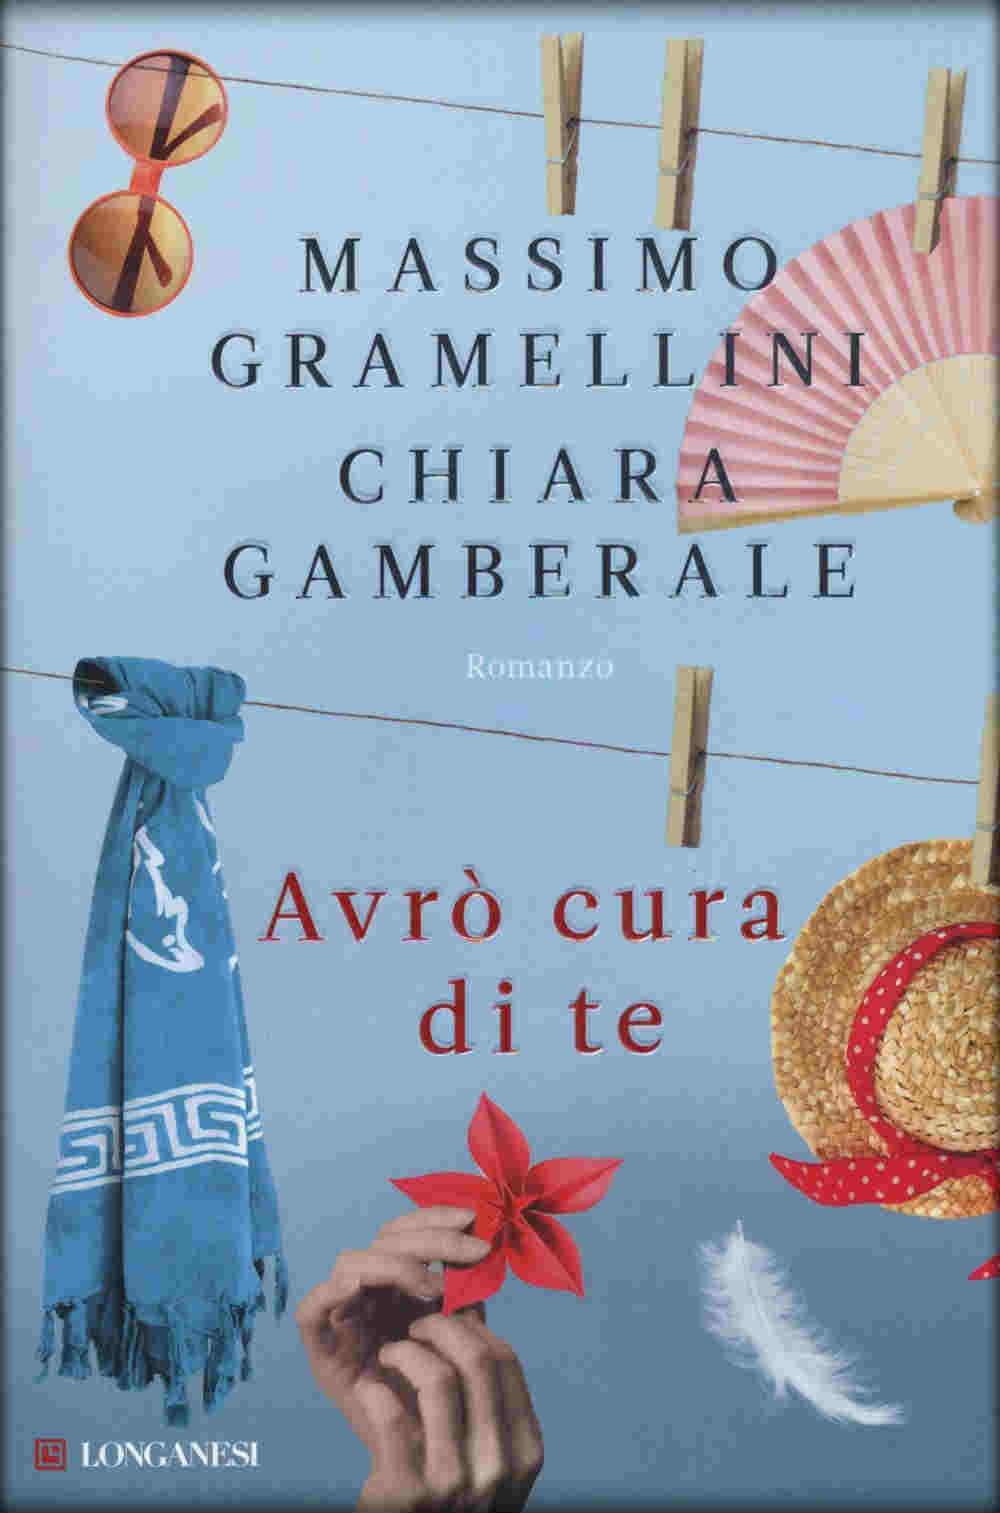 Avrò cura di te (M. Grammelini & C. Gamberale)